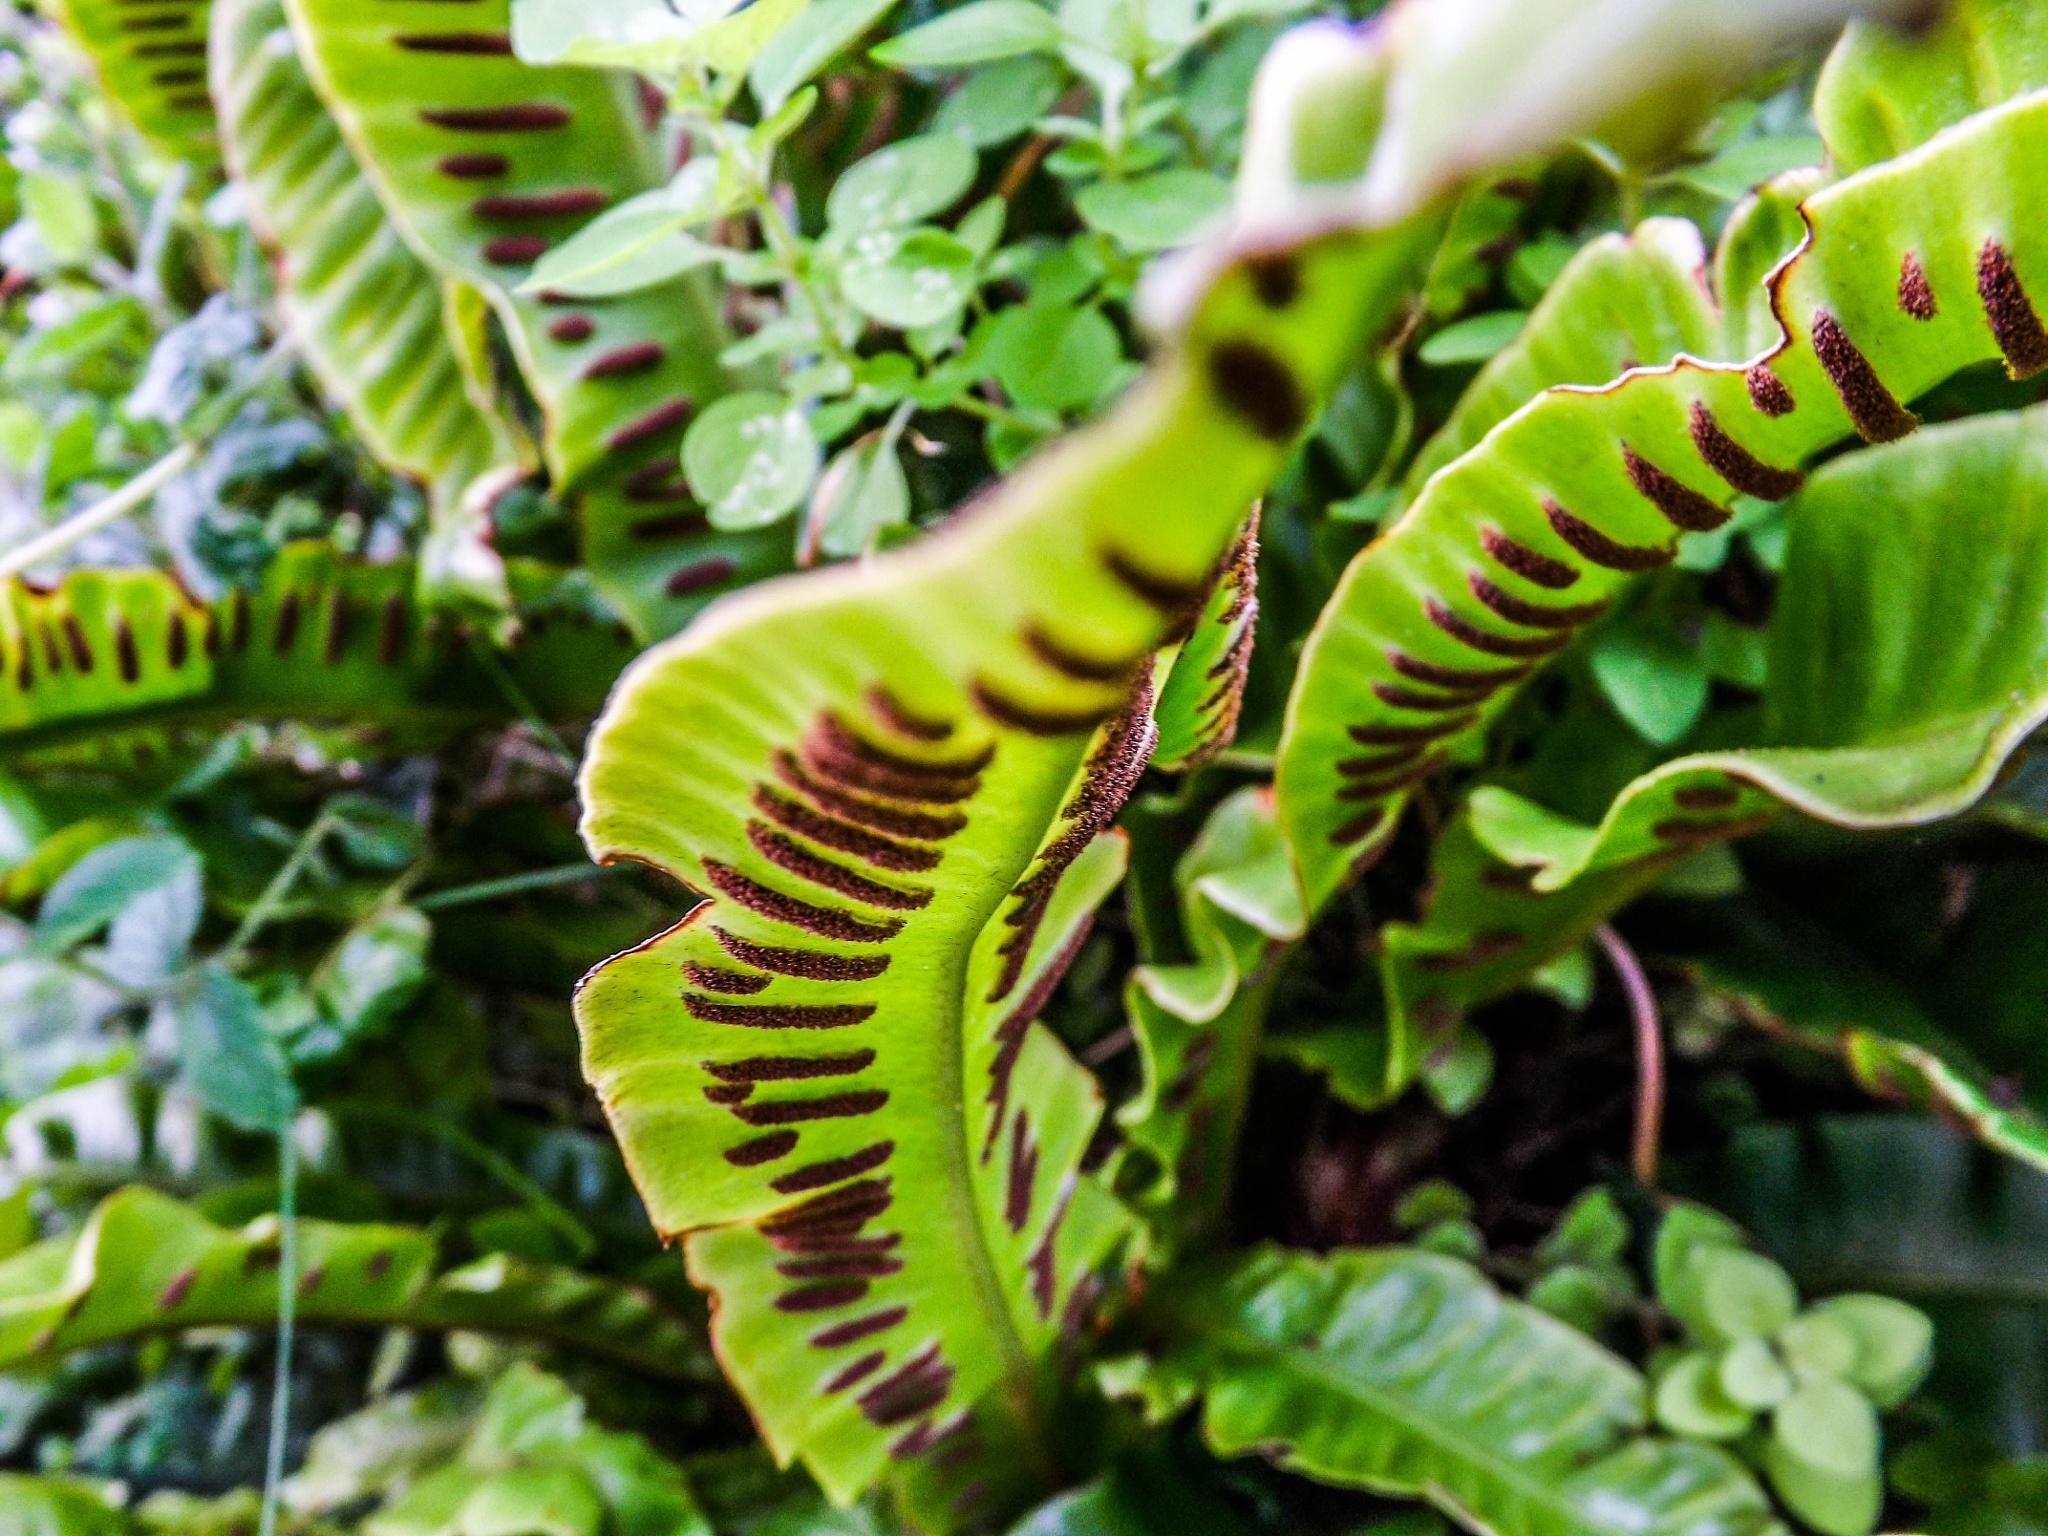 under the leaf by Gemma Sizer